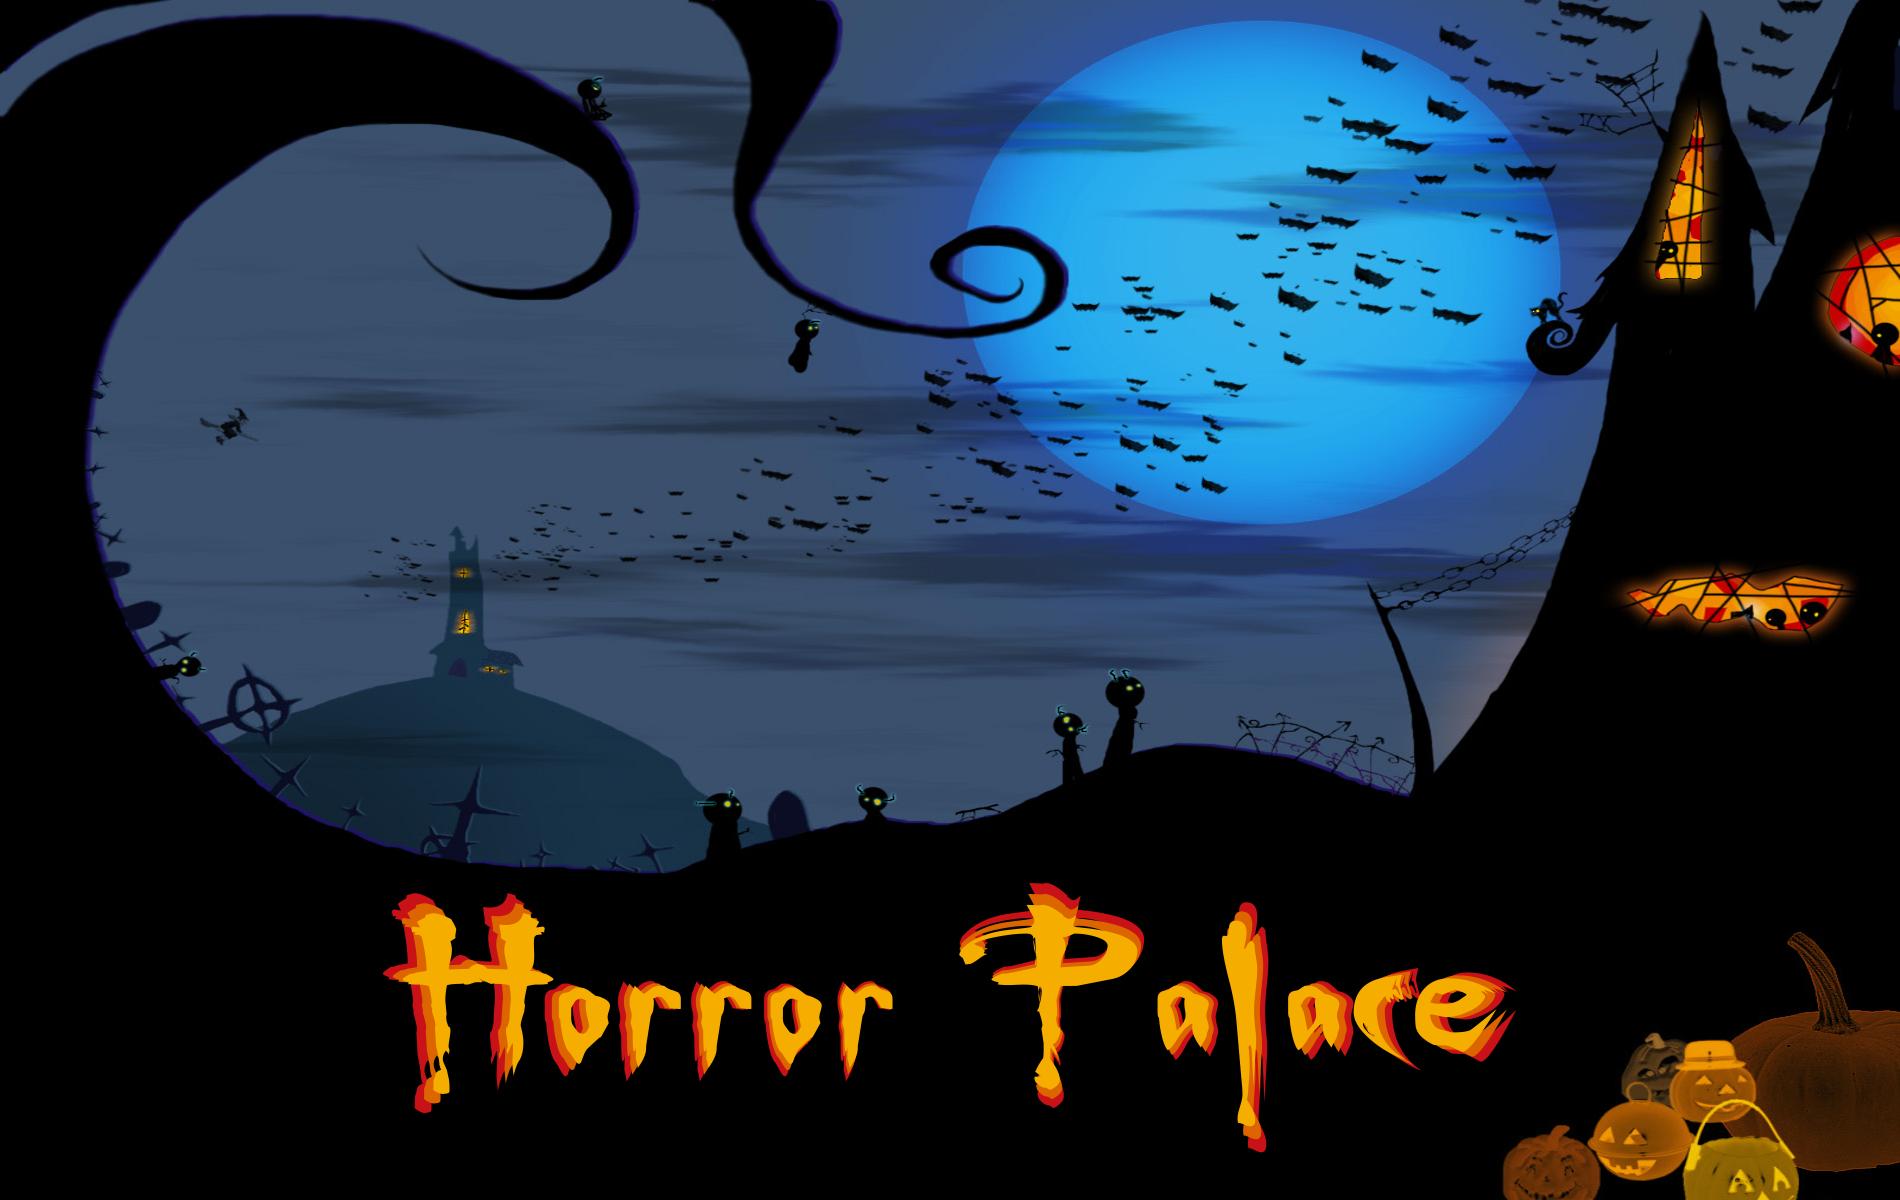 Horror Palace Wallpaper Blue Night Horror Palace Shop